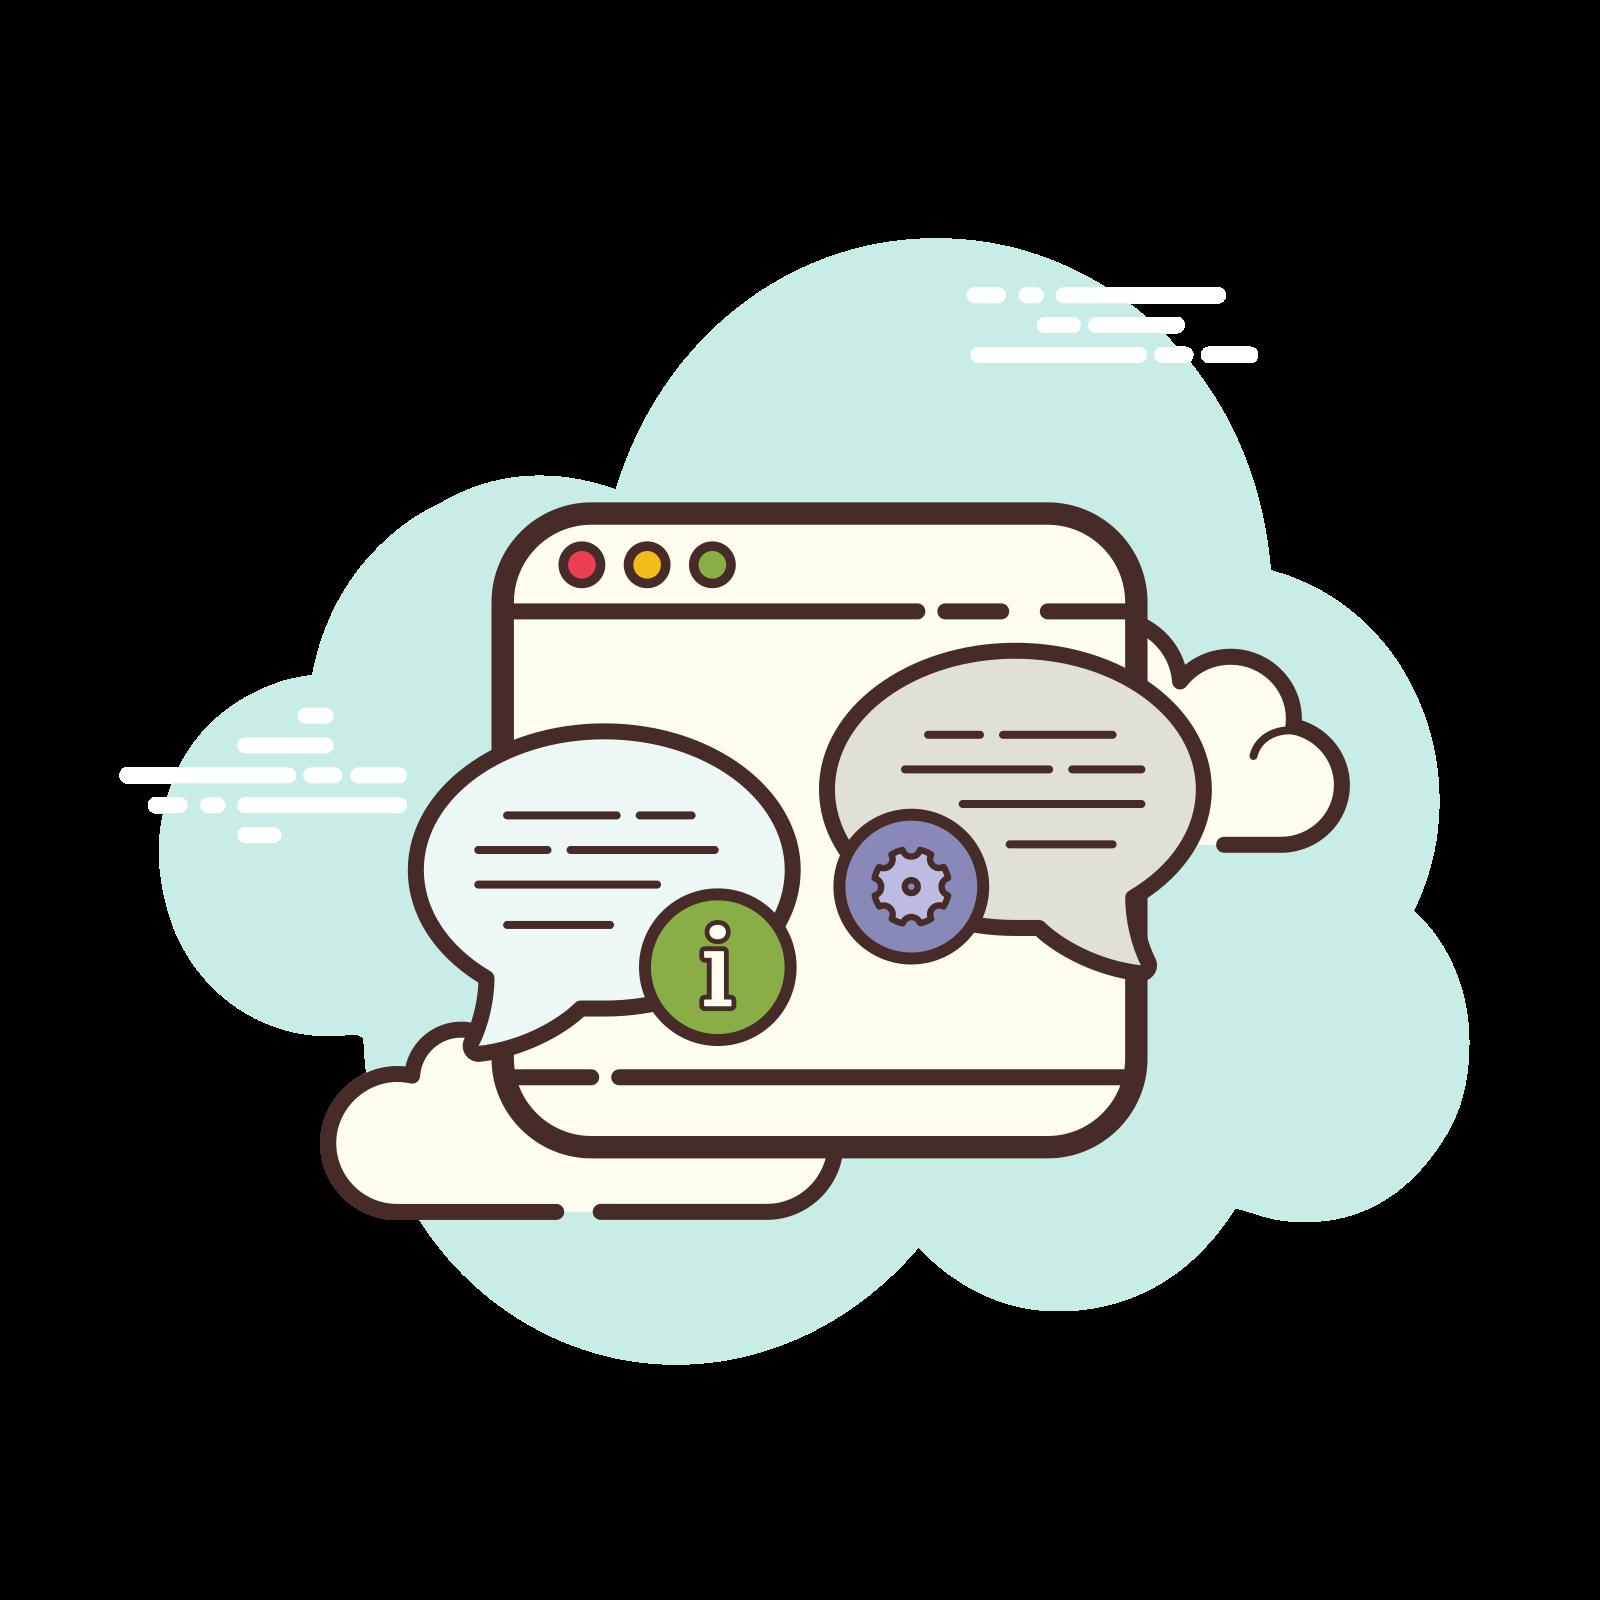 Customer Service Chat icon